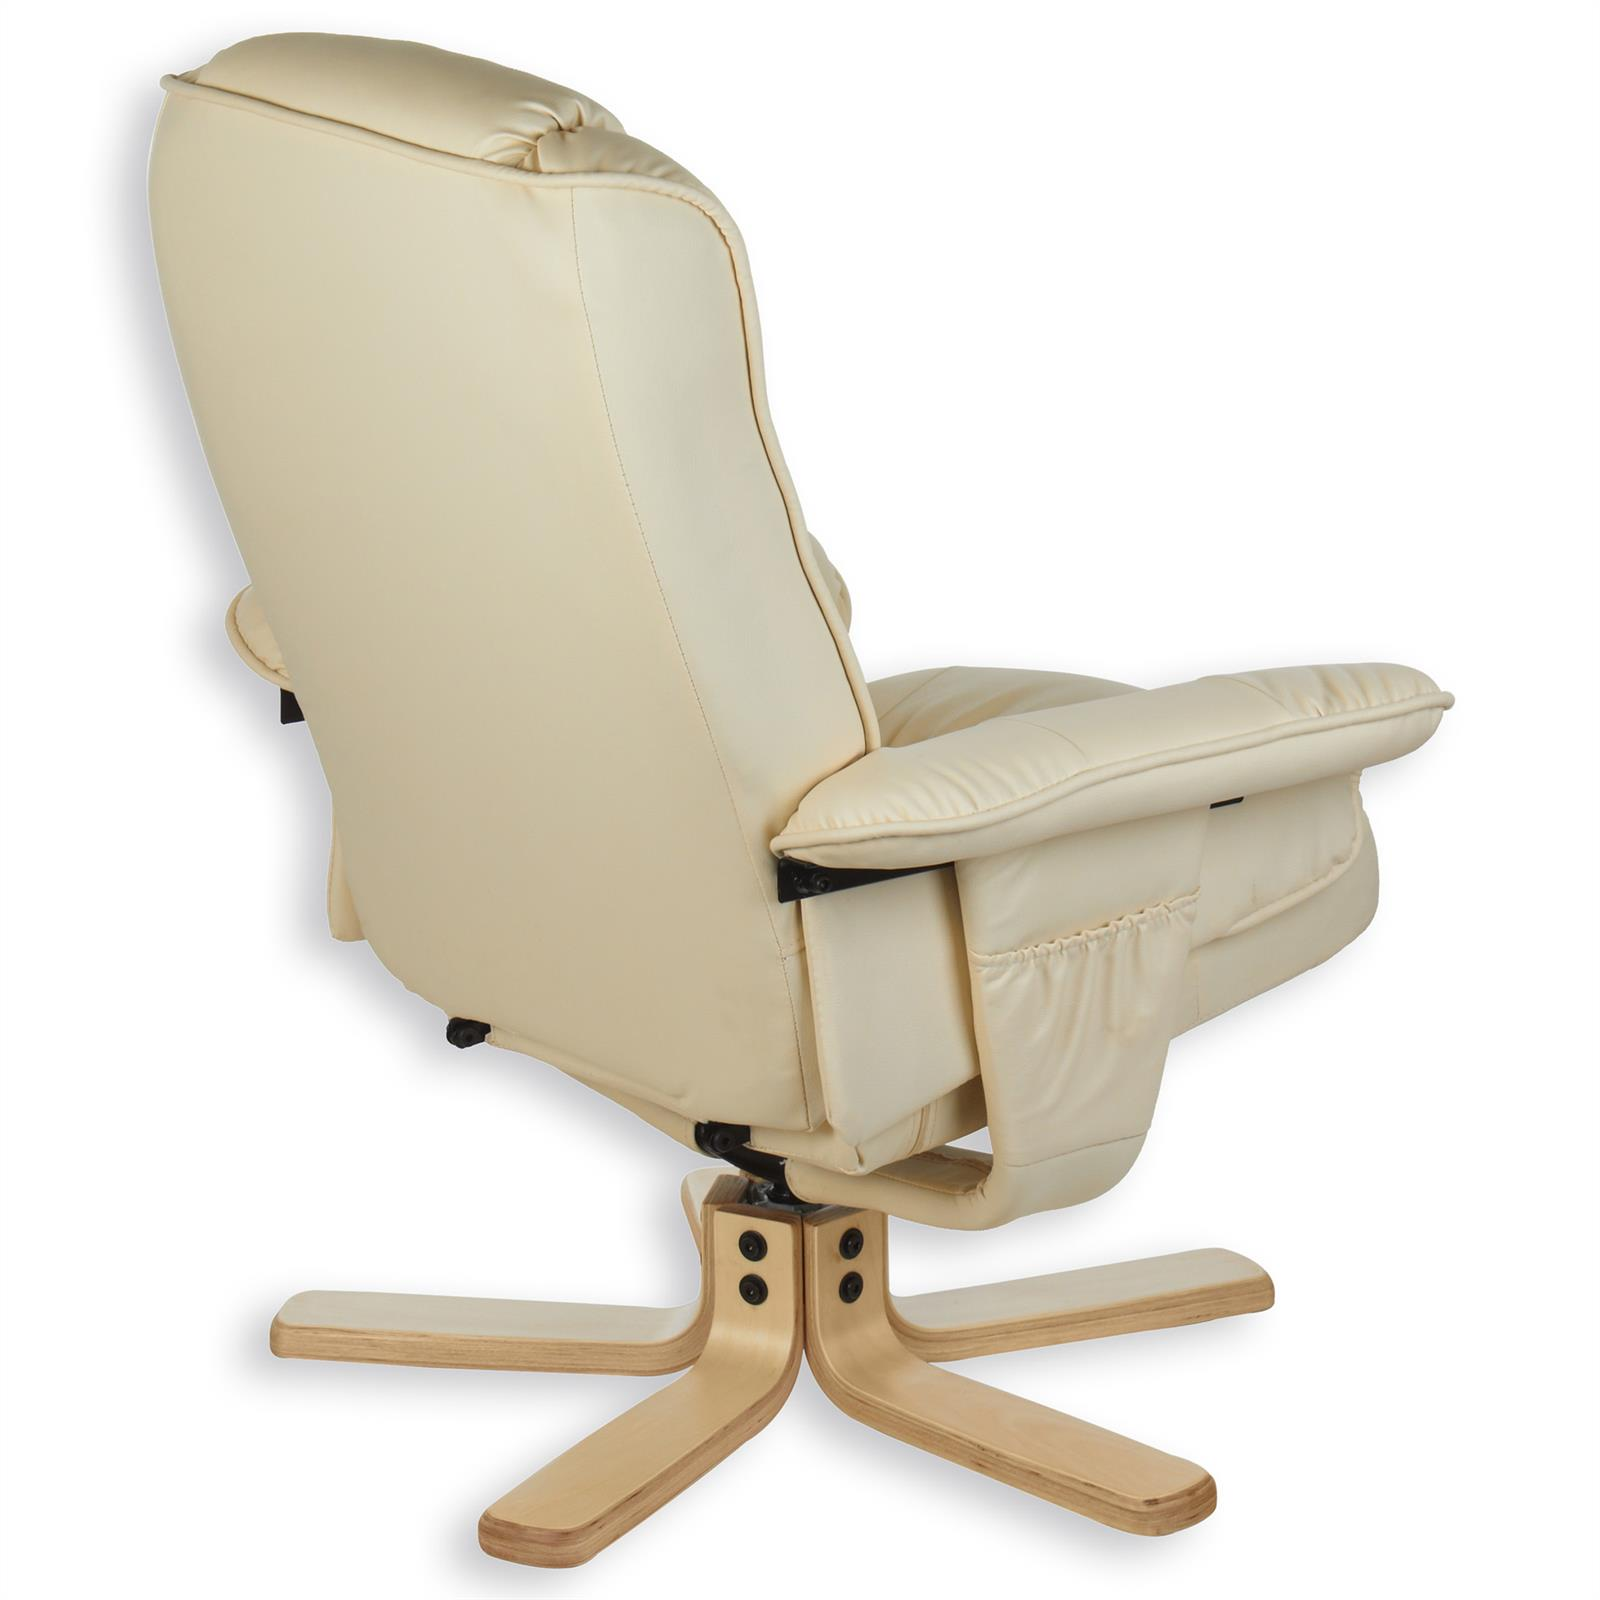 fernsehsessel mit hocker relaxsessel drehsessel tv sessel. Black Bedroom Furniture Sets. Home Design Ideas